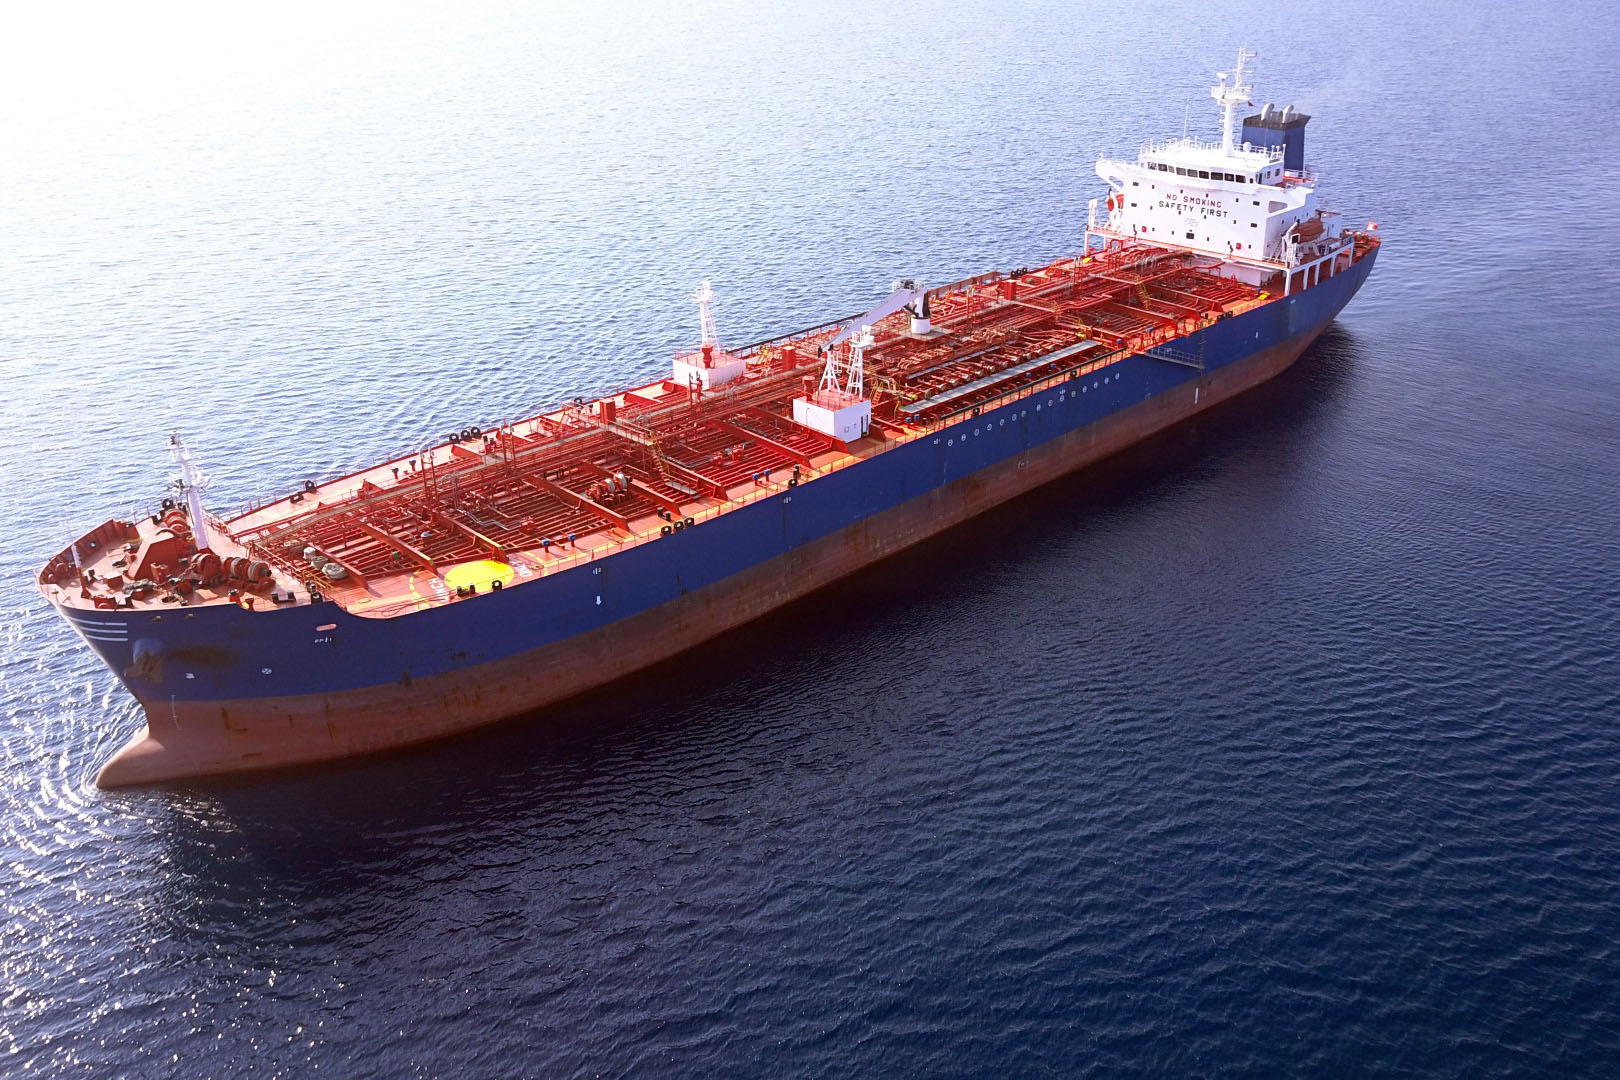 Al Seer Marine - BGN International form AED624 million JV partnership